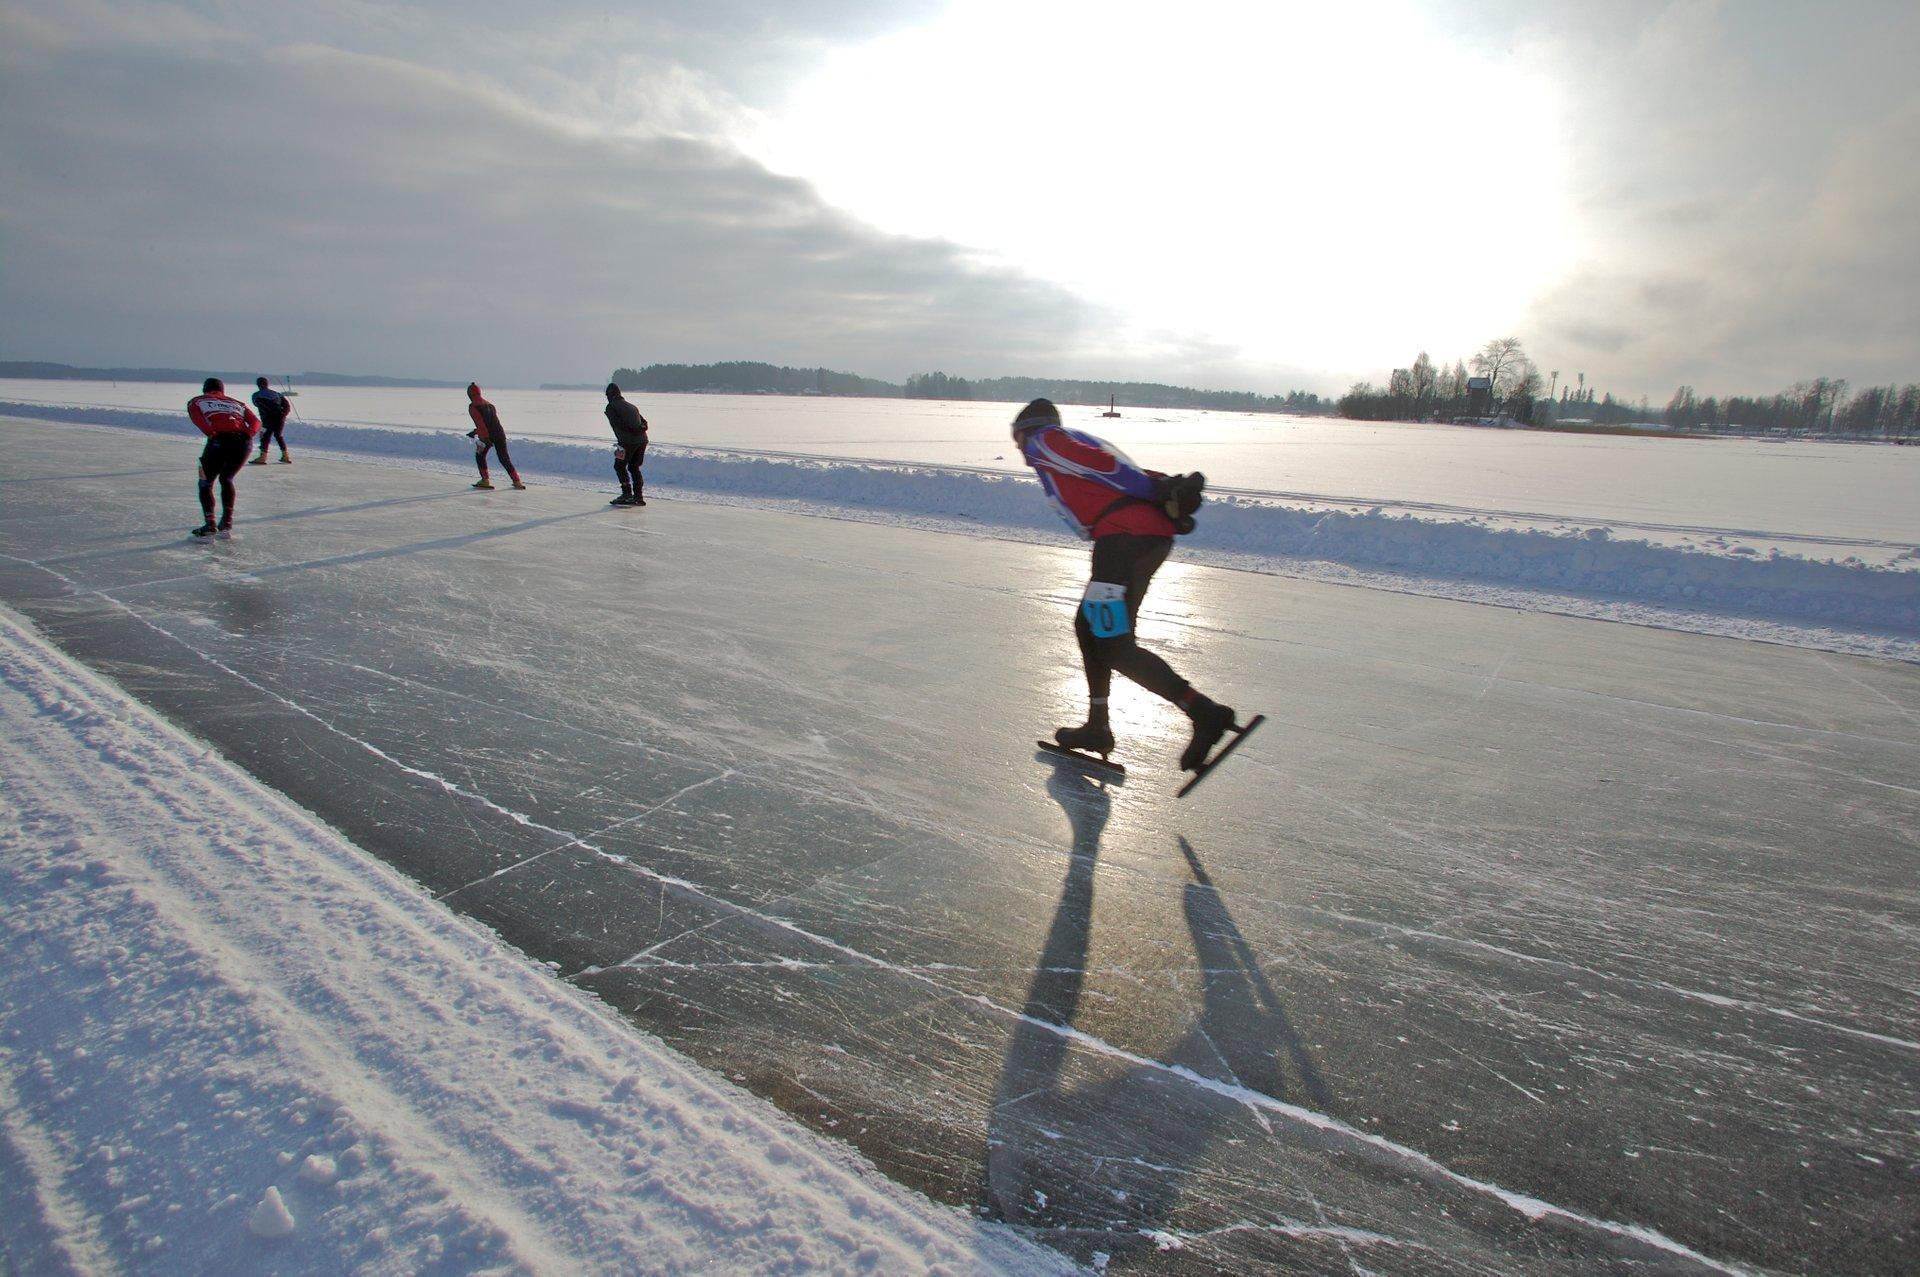 Best time for Finland Ice Marathon in Finland 2020